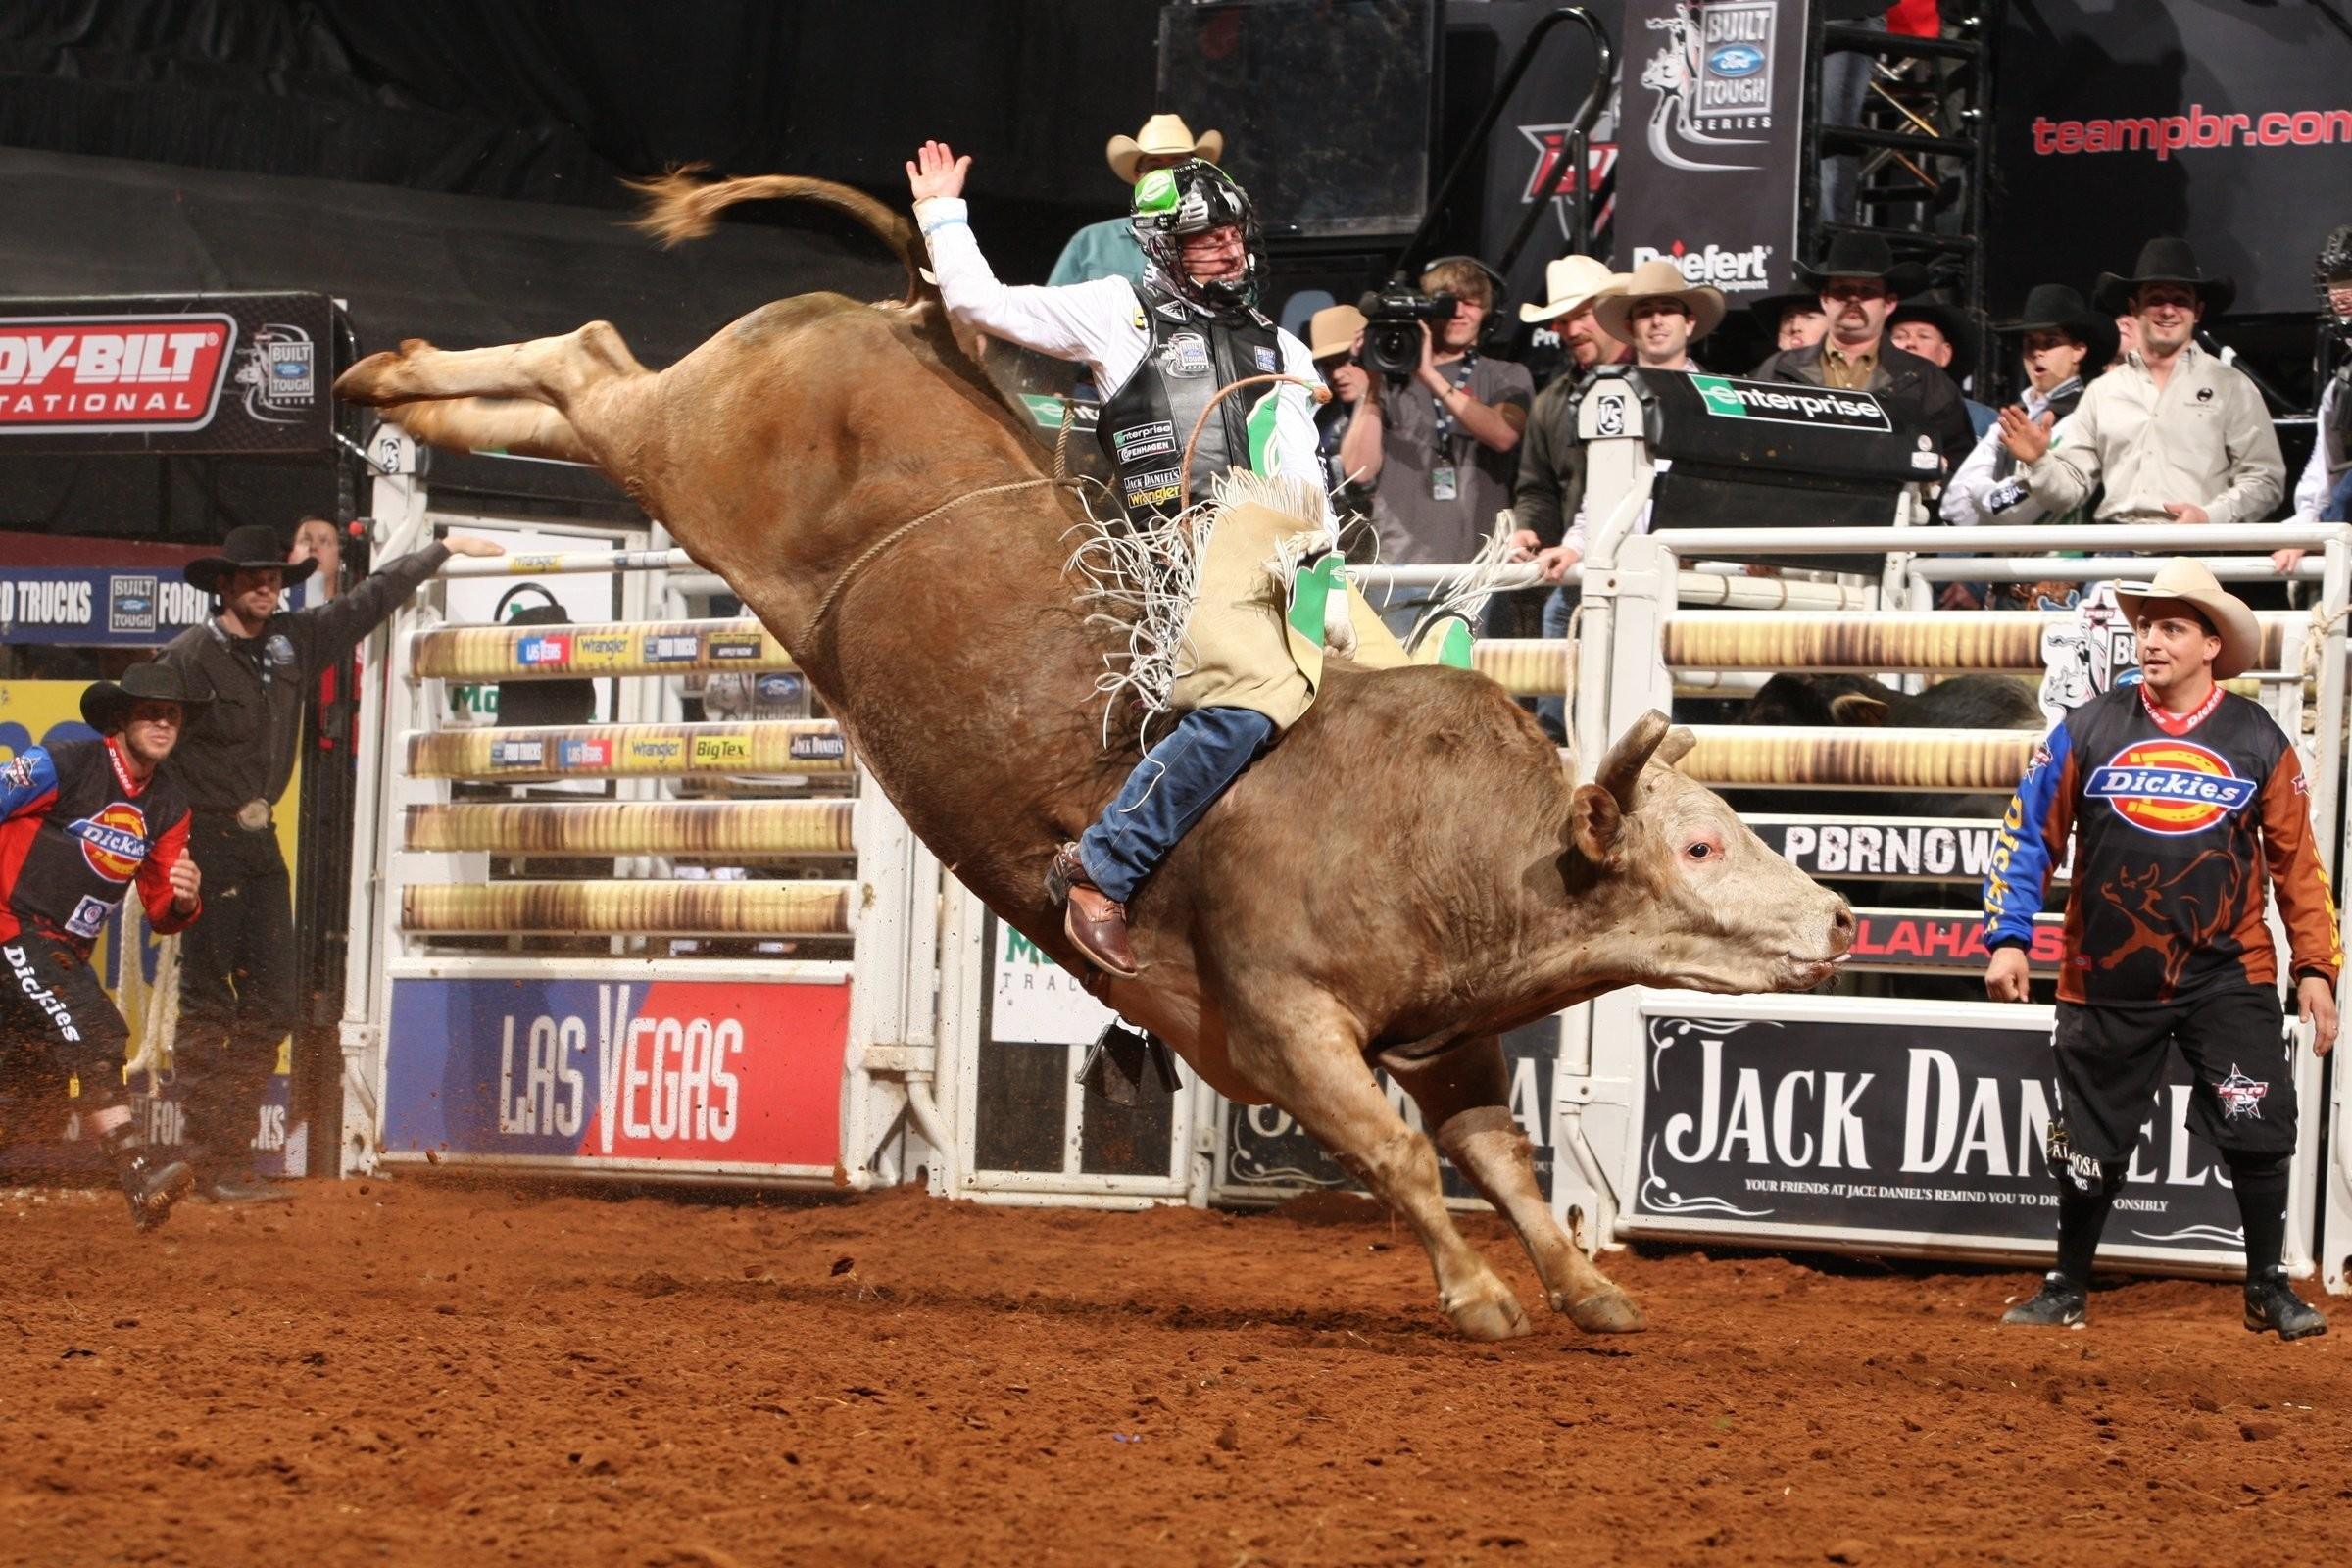 Bull riding wallpapers wallpapertag - Bull riding wallpapers ...